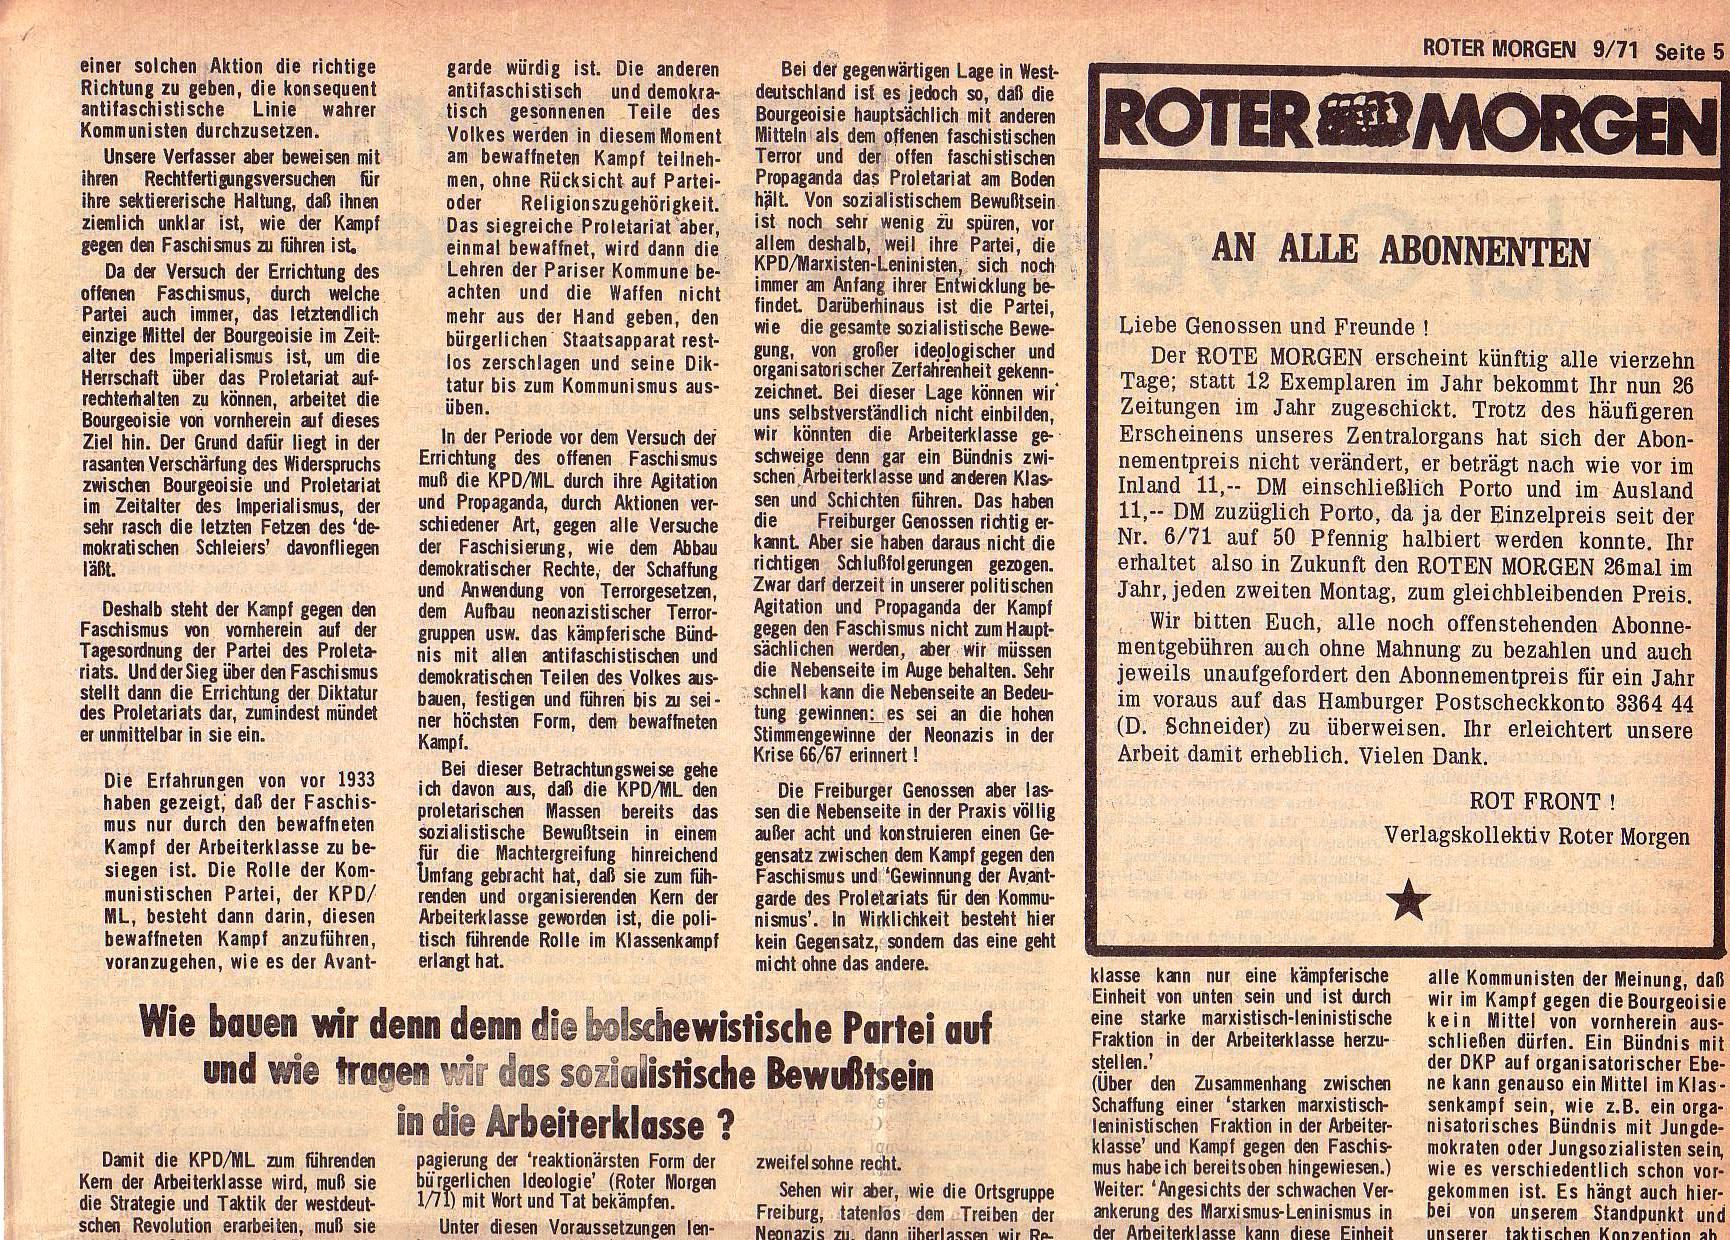 Roter Morgen, 5. Jg., 13. September 1971, Nr. 9, Seite 5a